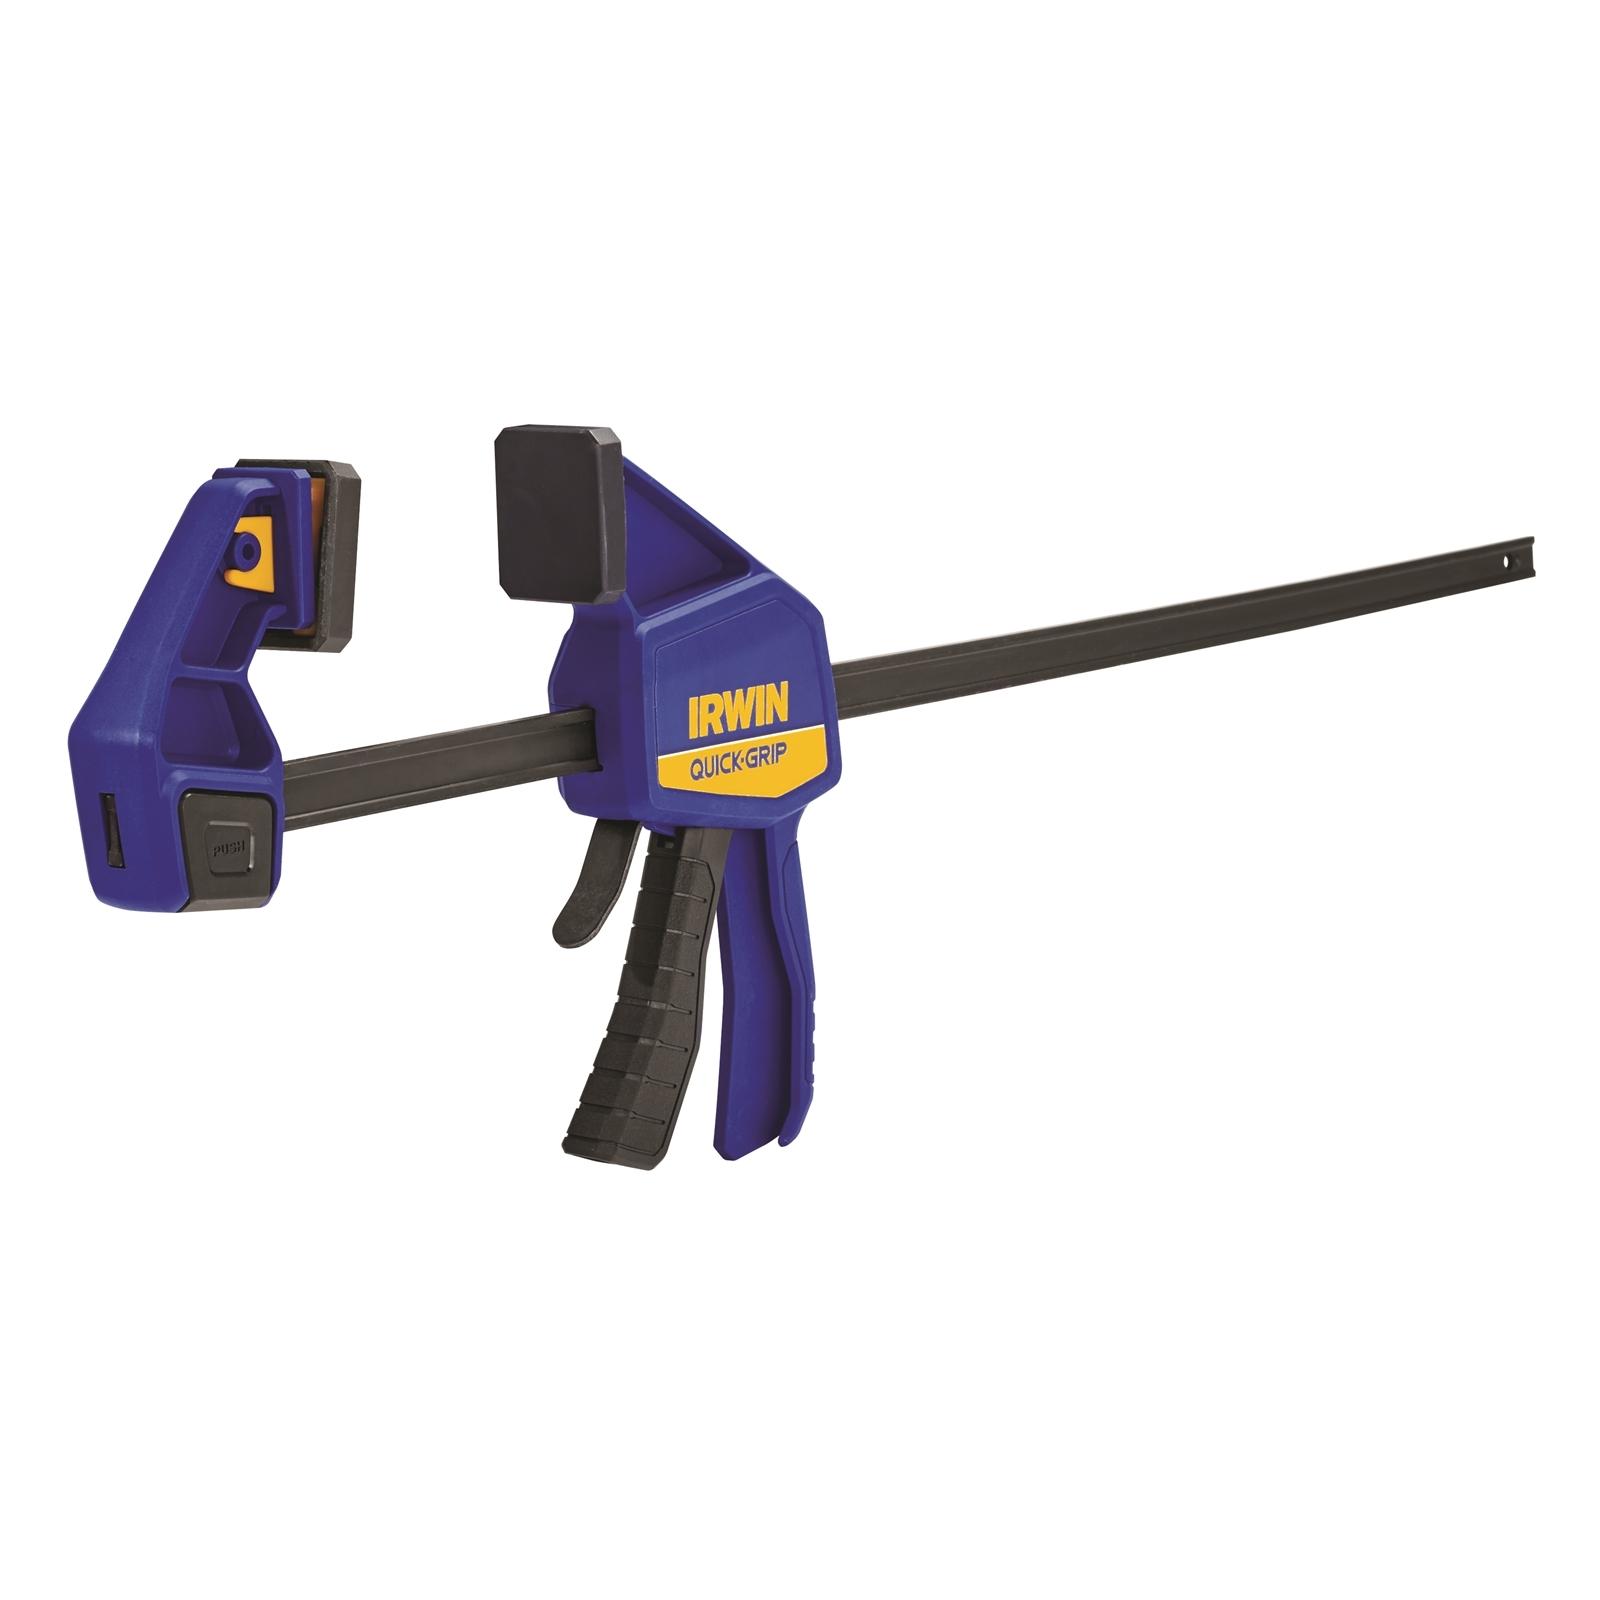 Irwin 610mm Quick-Grip Medium Duty Bar Clamp